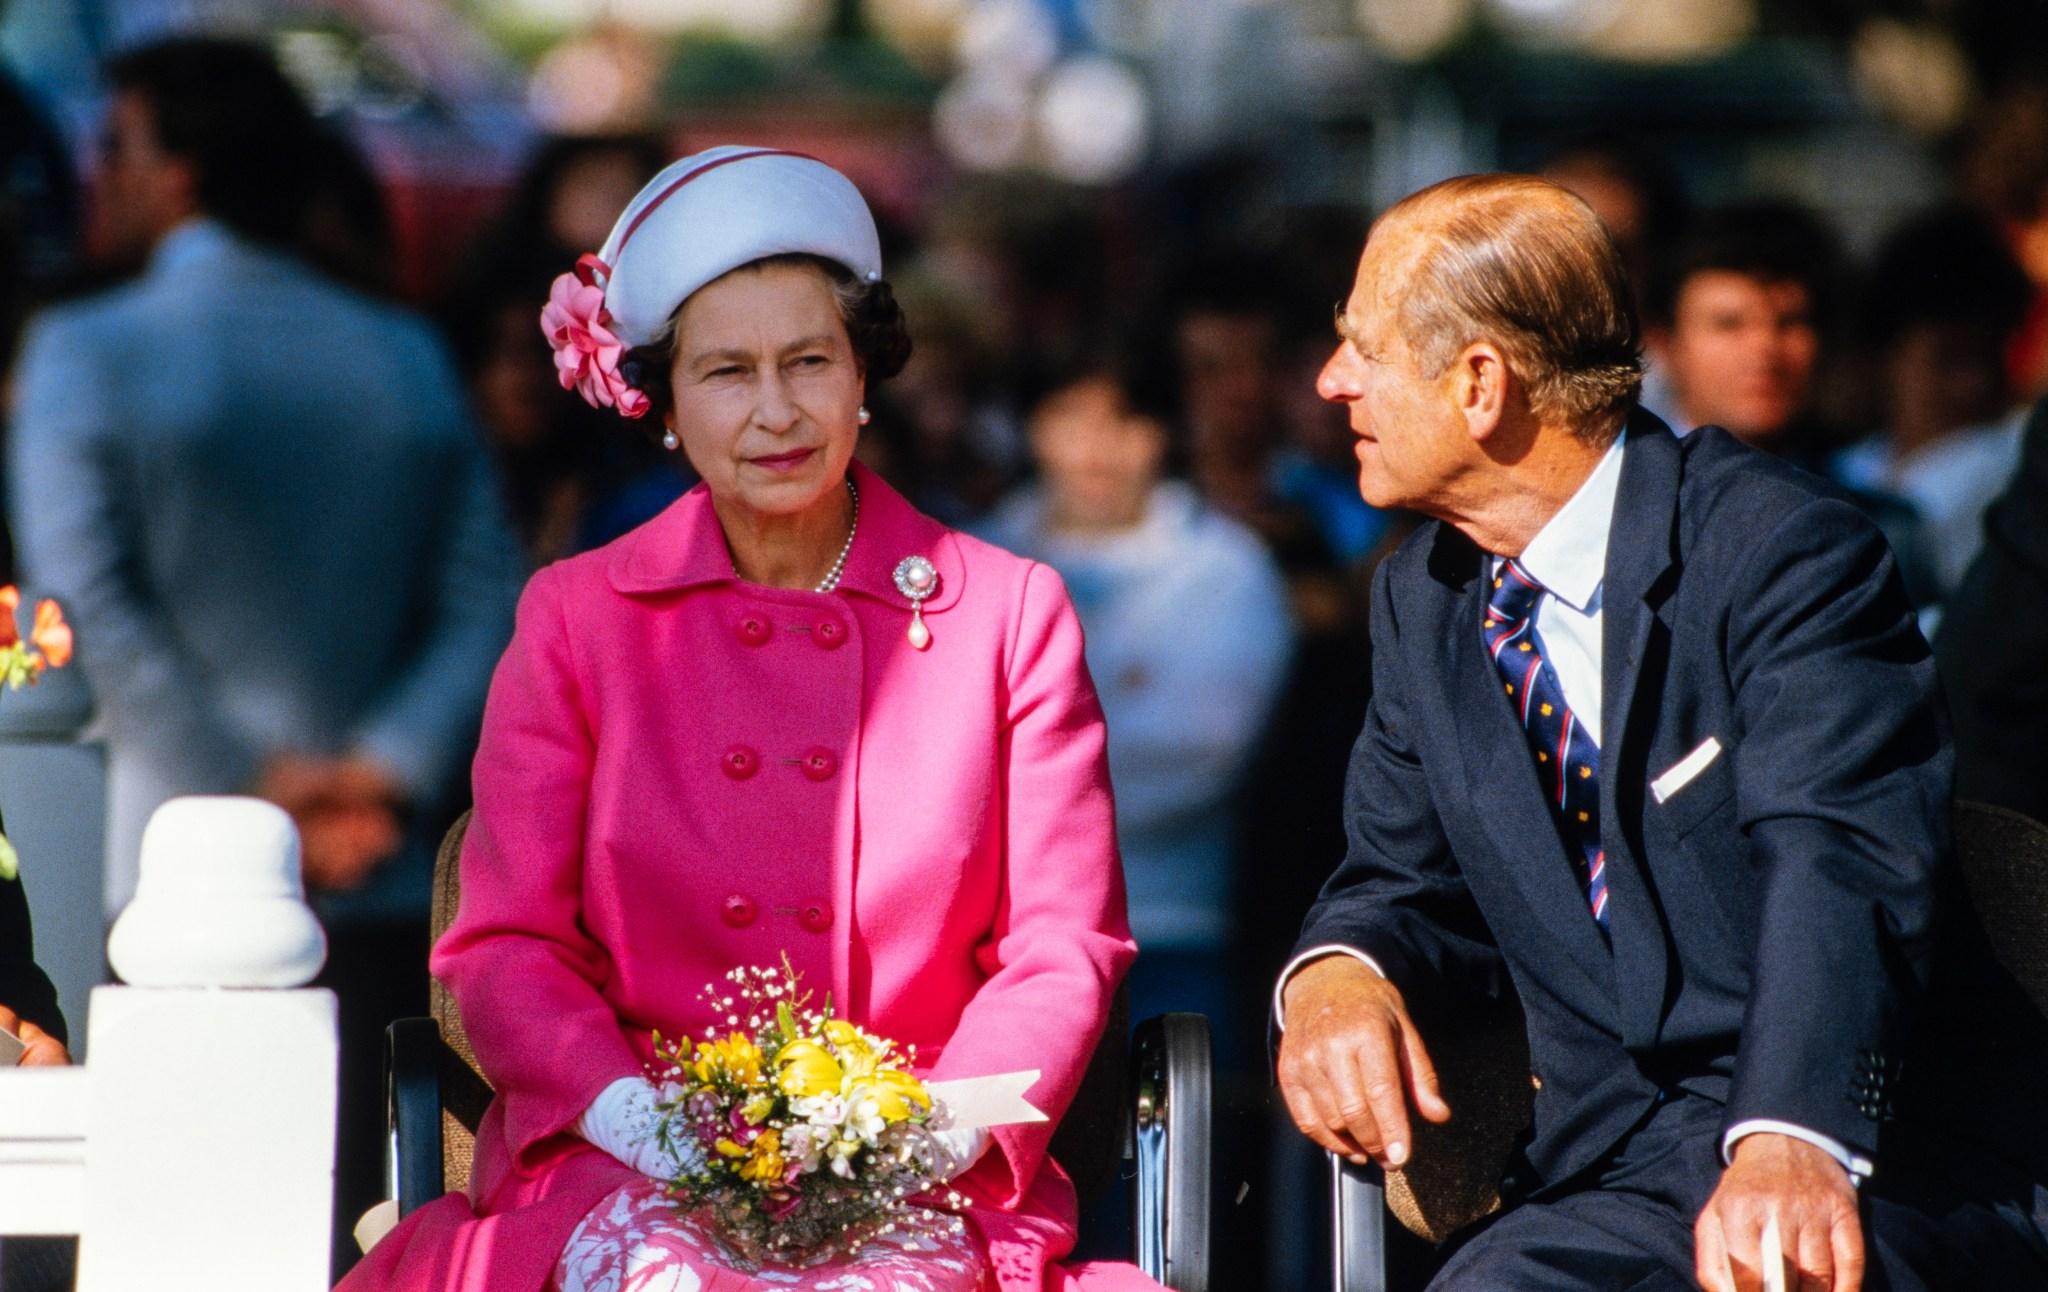 Queen Elizabeth II and Prince Philip in Wilmot Park, Fredericton, N.B., Canada, Sept. 25, 1984.